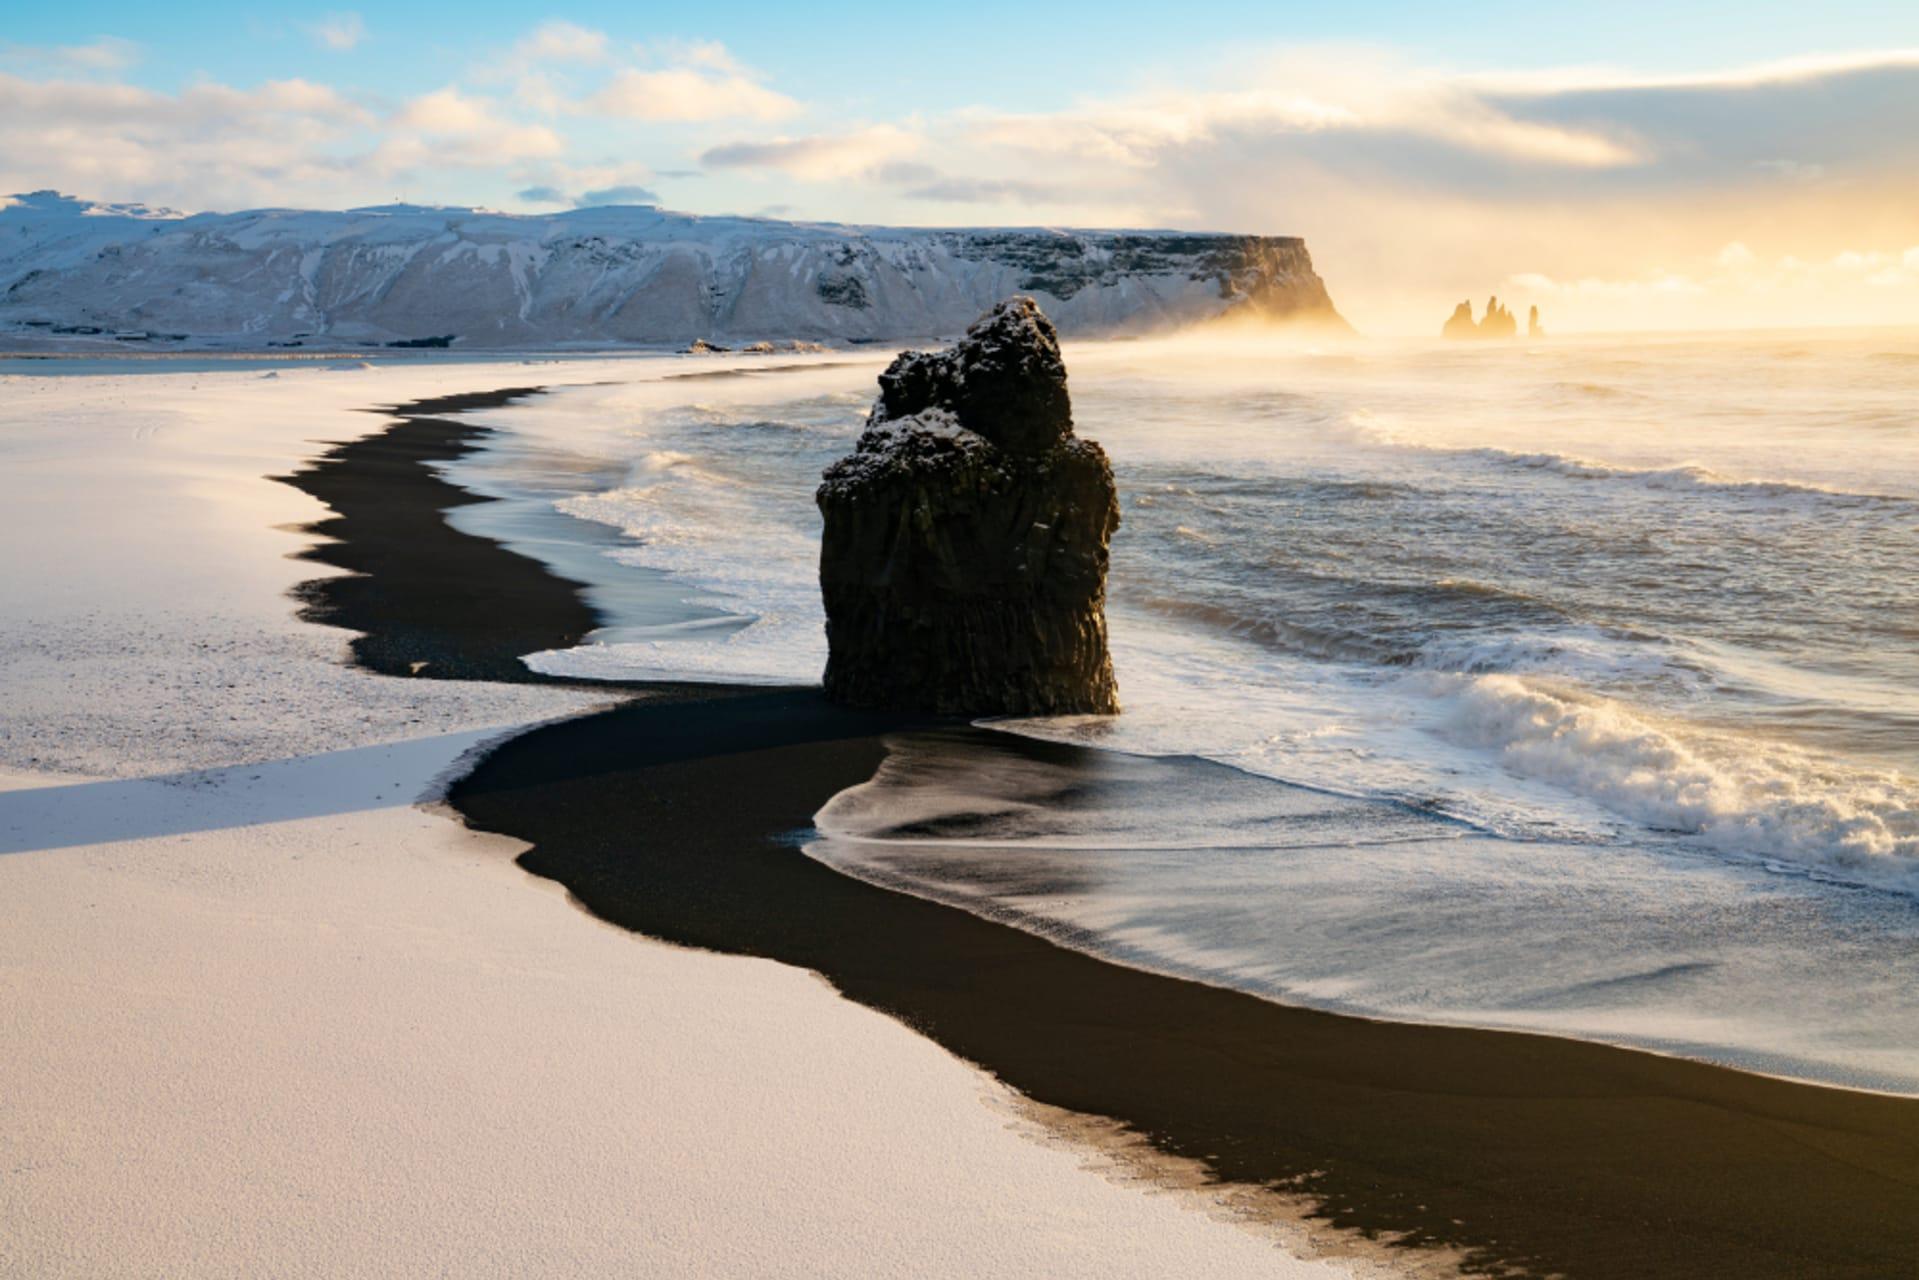 South Iceland - Reynisfjara – Black Sand Beach and Cliffs